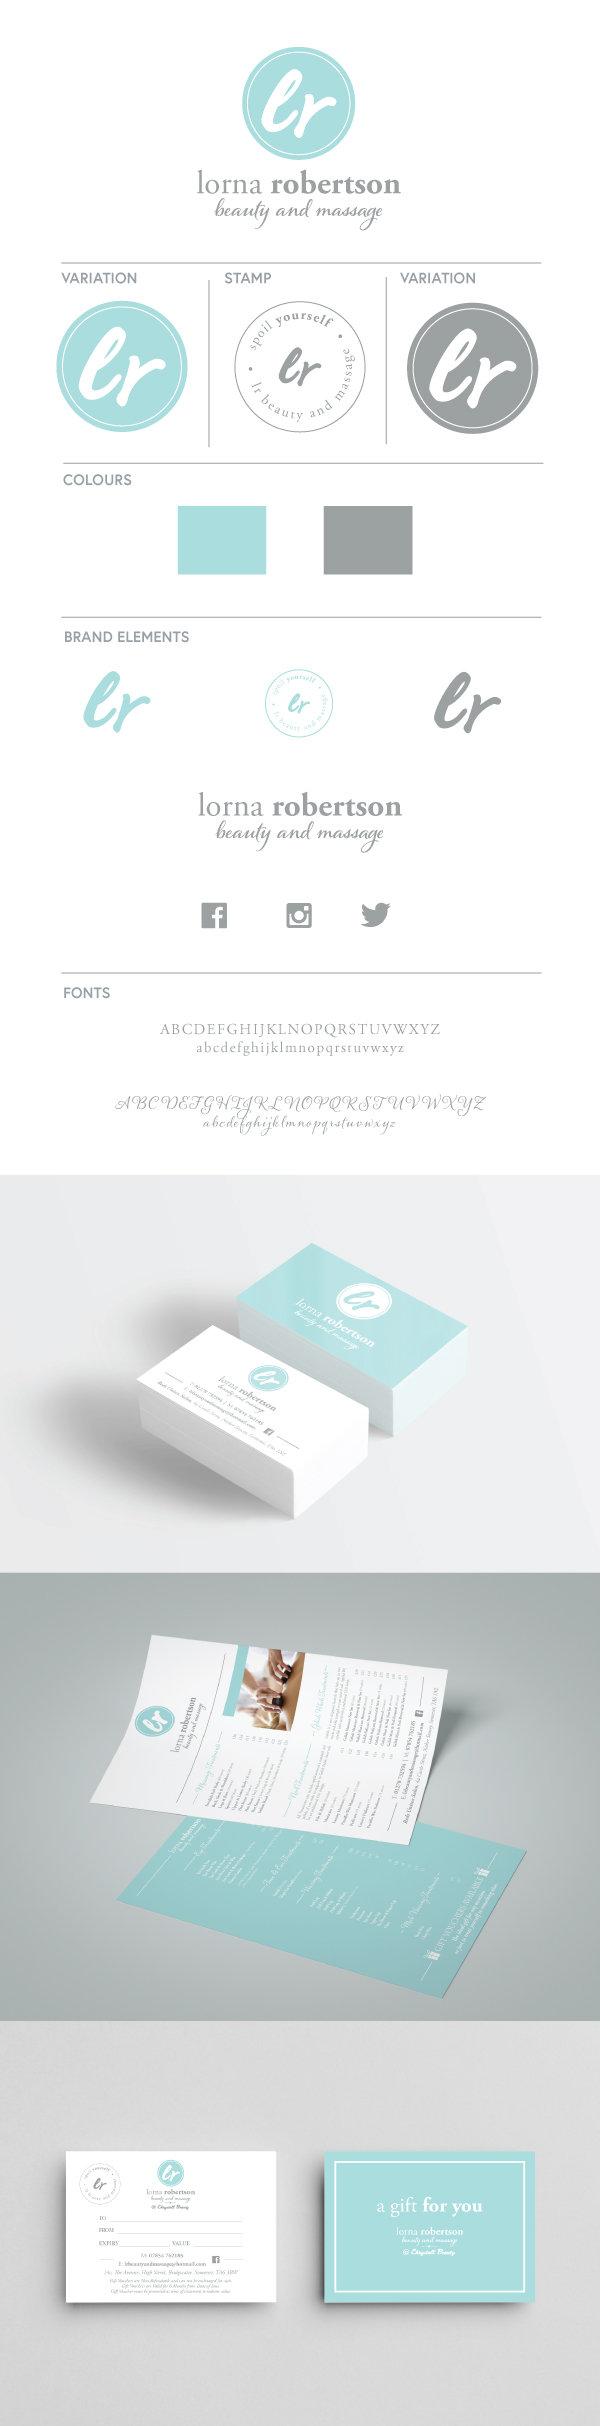 LR-Beauty-Brand.jpg